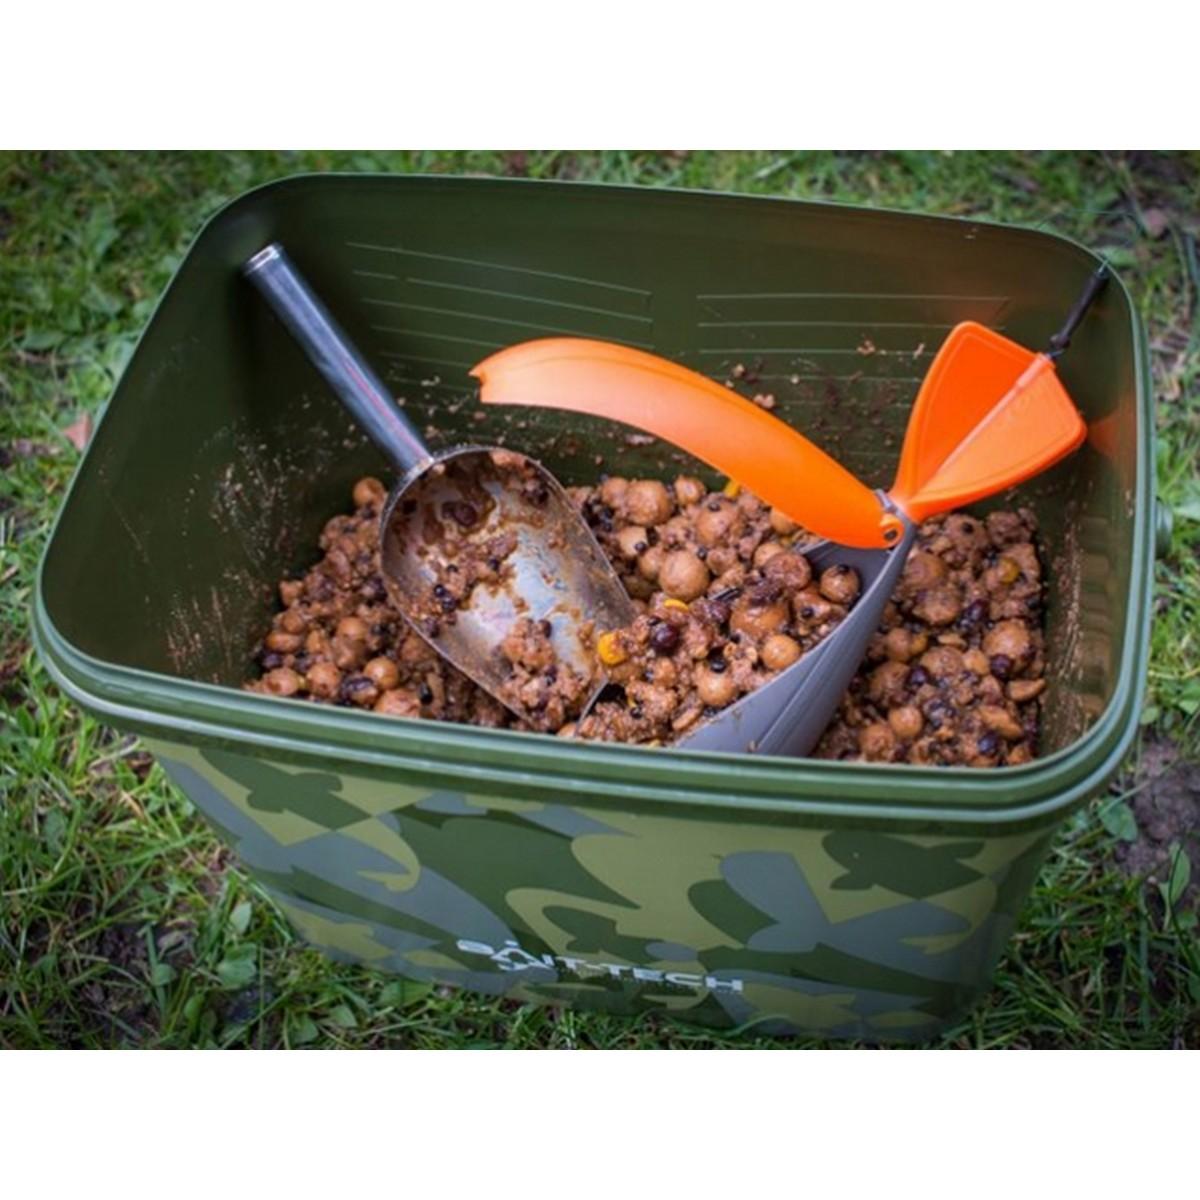 Bait-Tech Utility Camo Bucket with Insert Tray